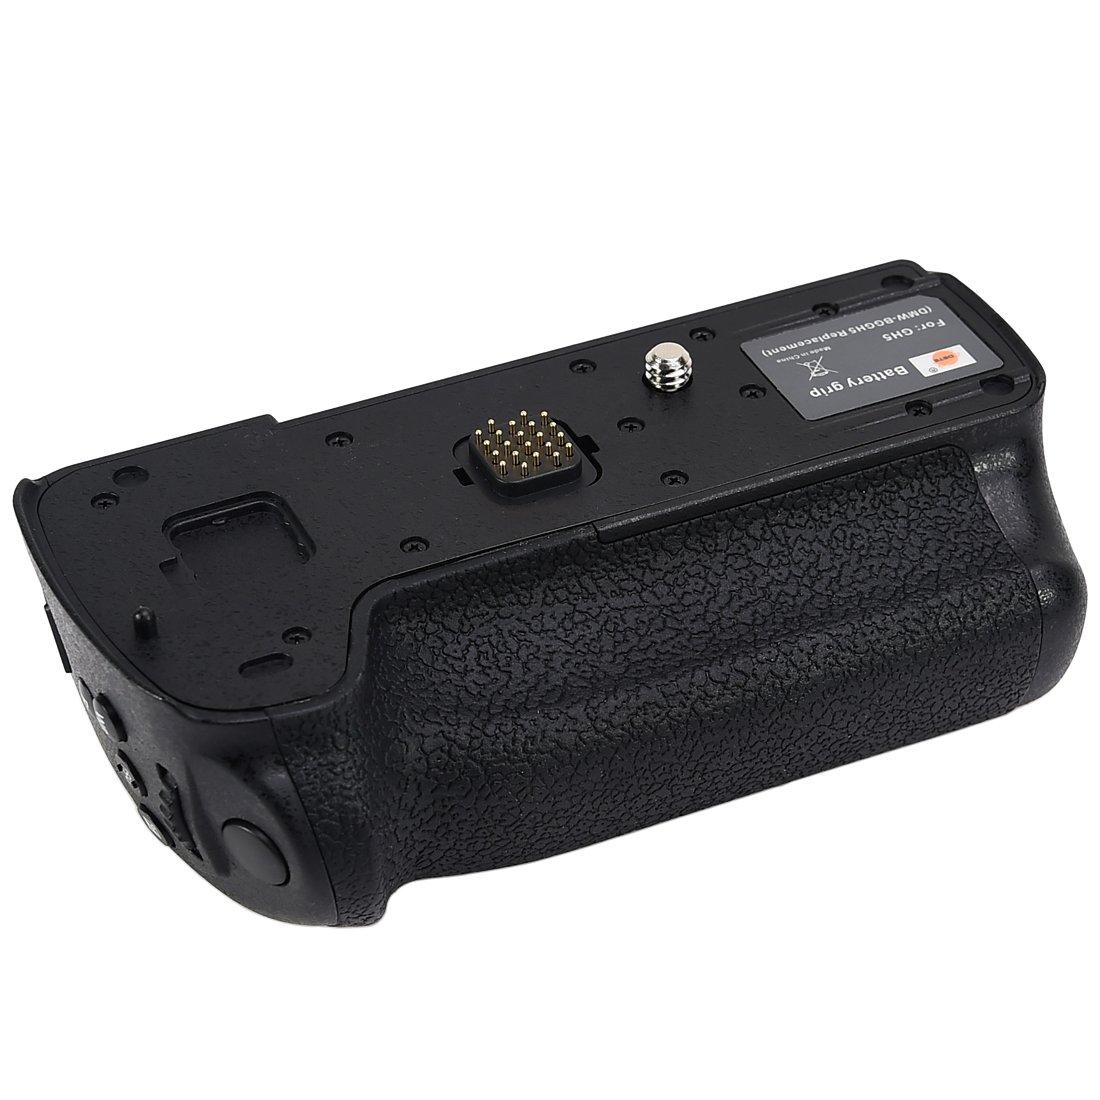 DSTE Pro DMW-BGGH5 DMW-BGGH5GK Vertical Composition Battery Grip for Panasonic GH5 GH5S Lumix GH5 Digital Camera as DMW-BLF19 BLF19E